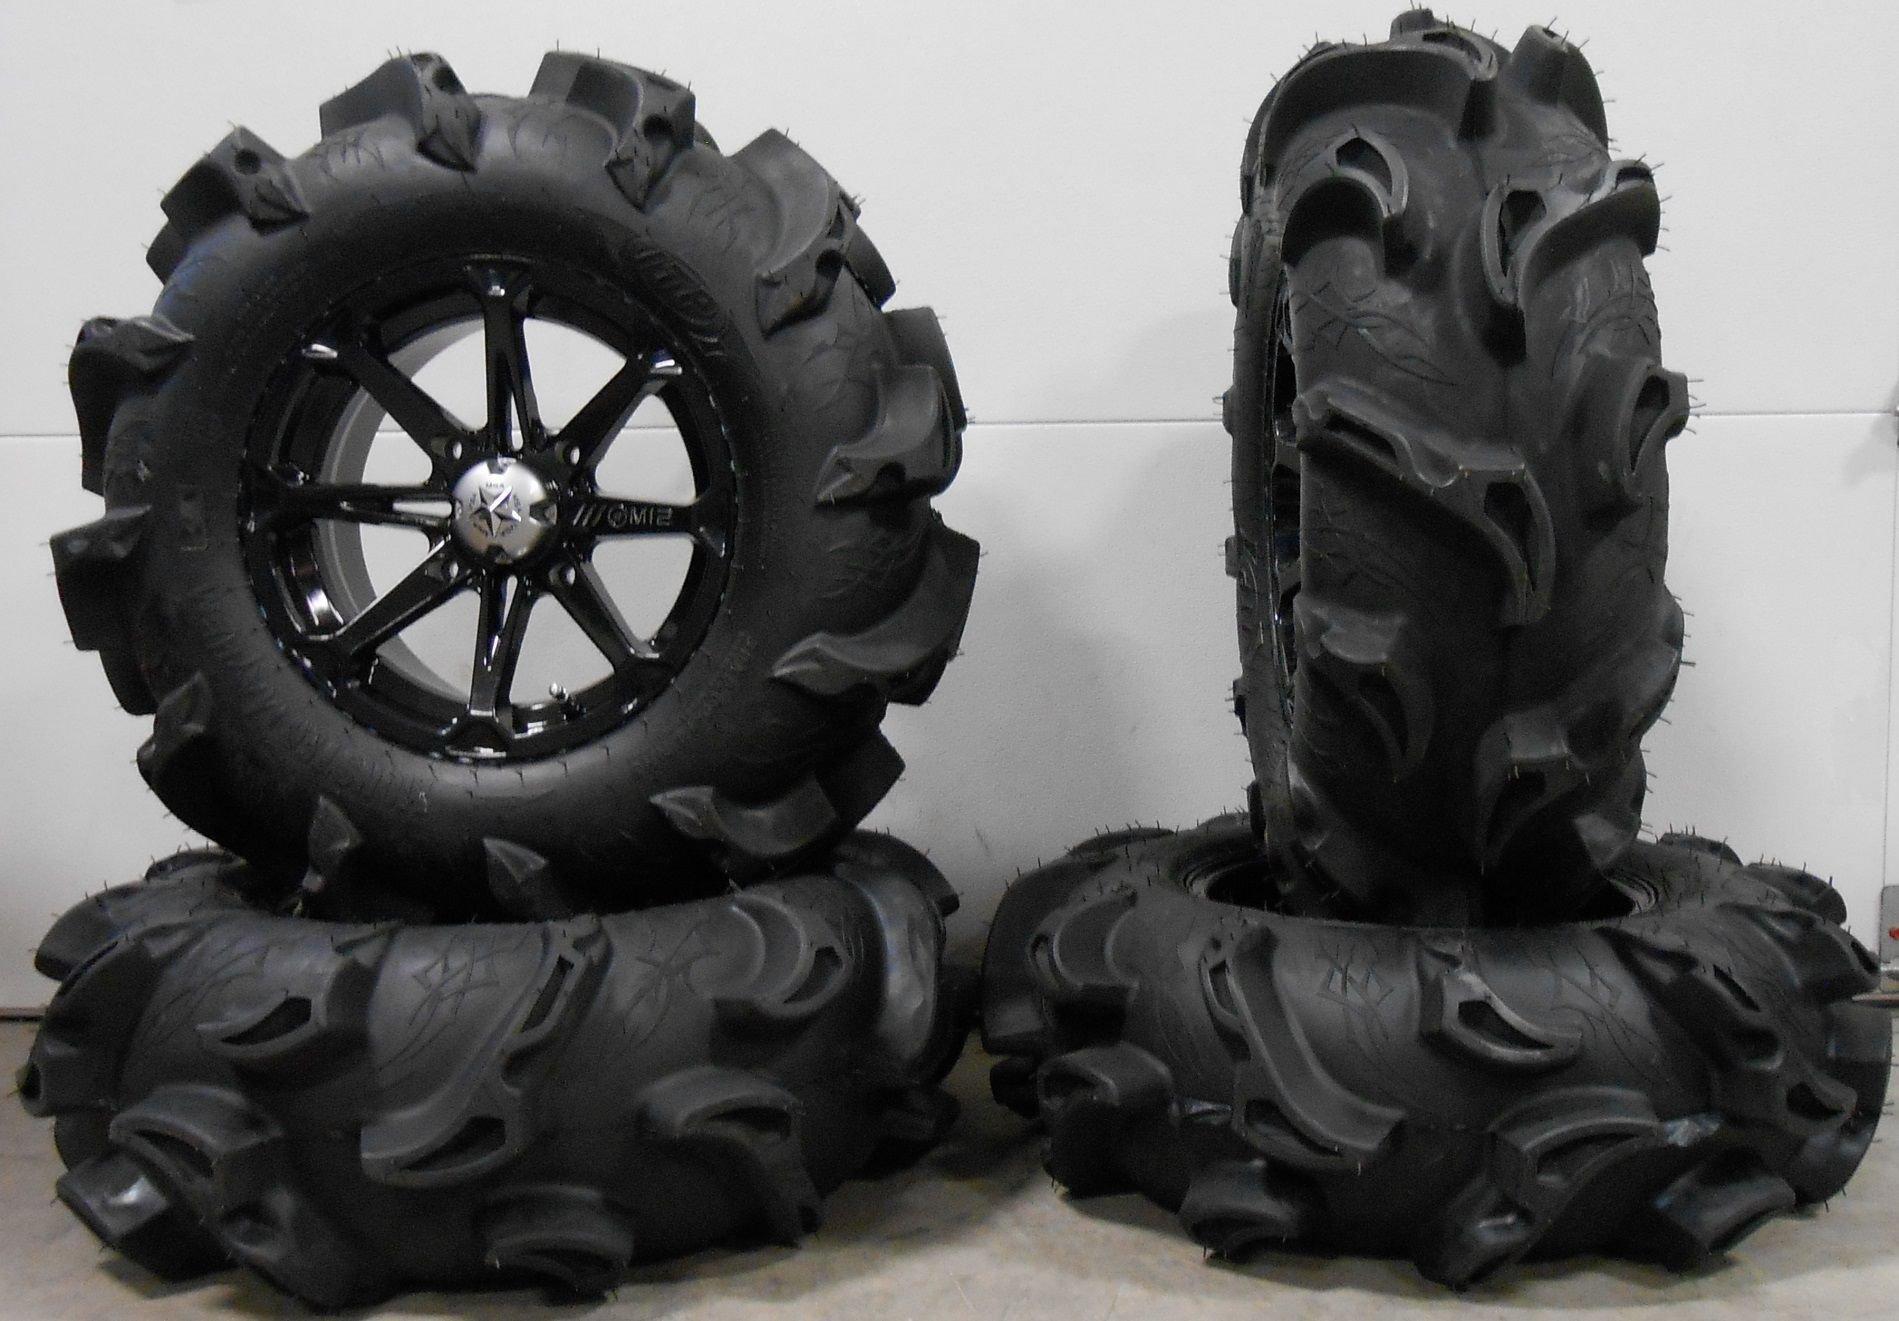 Bundle - 9 Items: MSA Black Diesel 14'' ATV Wheels 30'' Monster Mayhem Tires [4x110 Bolt Pattern 10mmx1.25 Lug Kit]